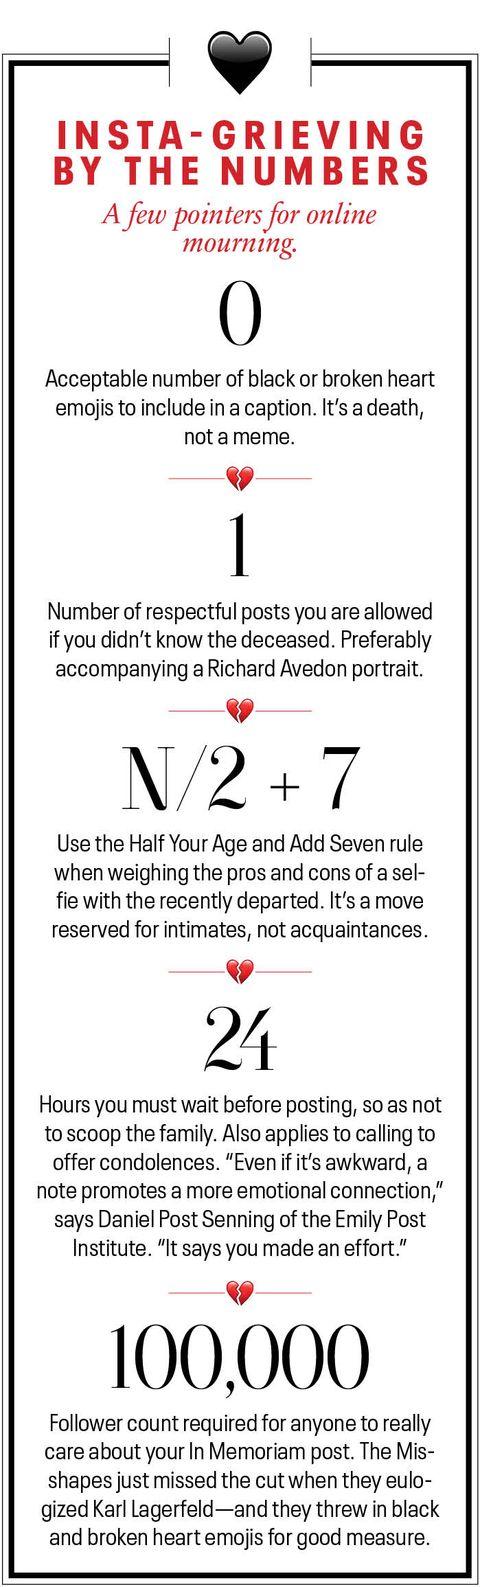 Rules for Posting on Social Media after a Celebrity Death